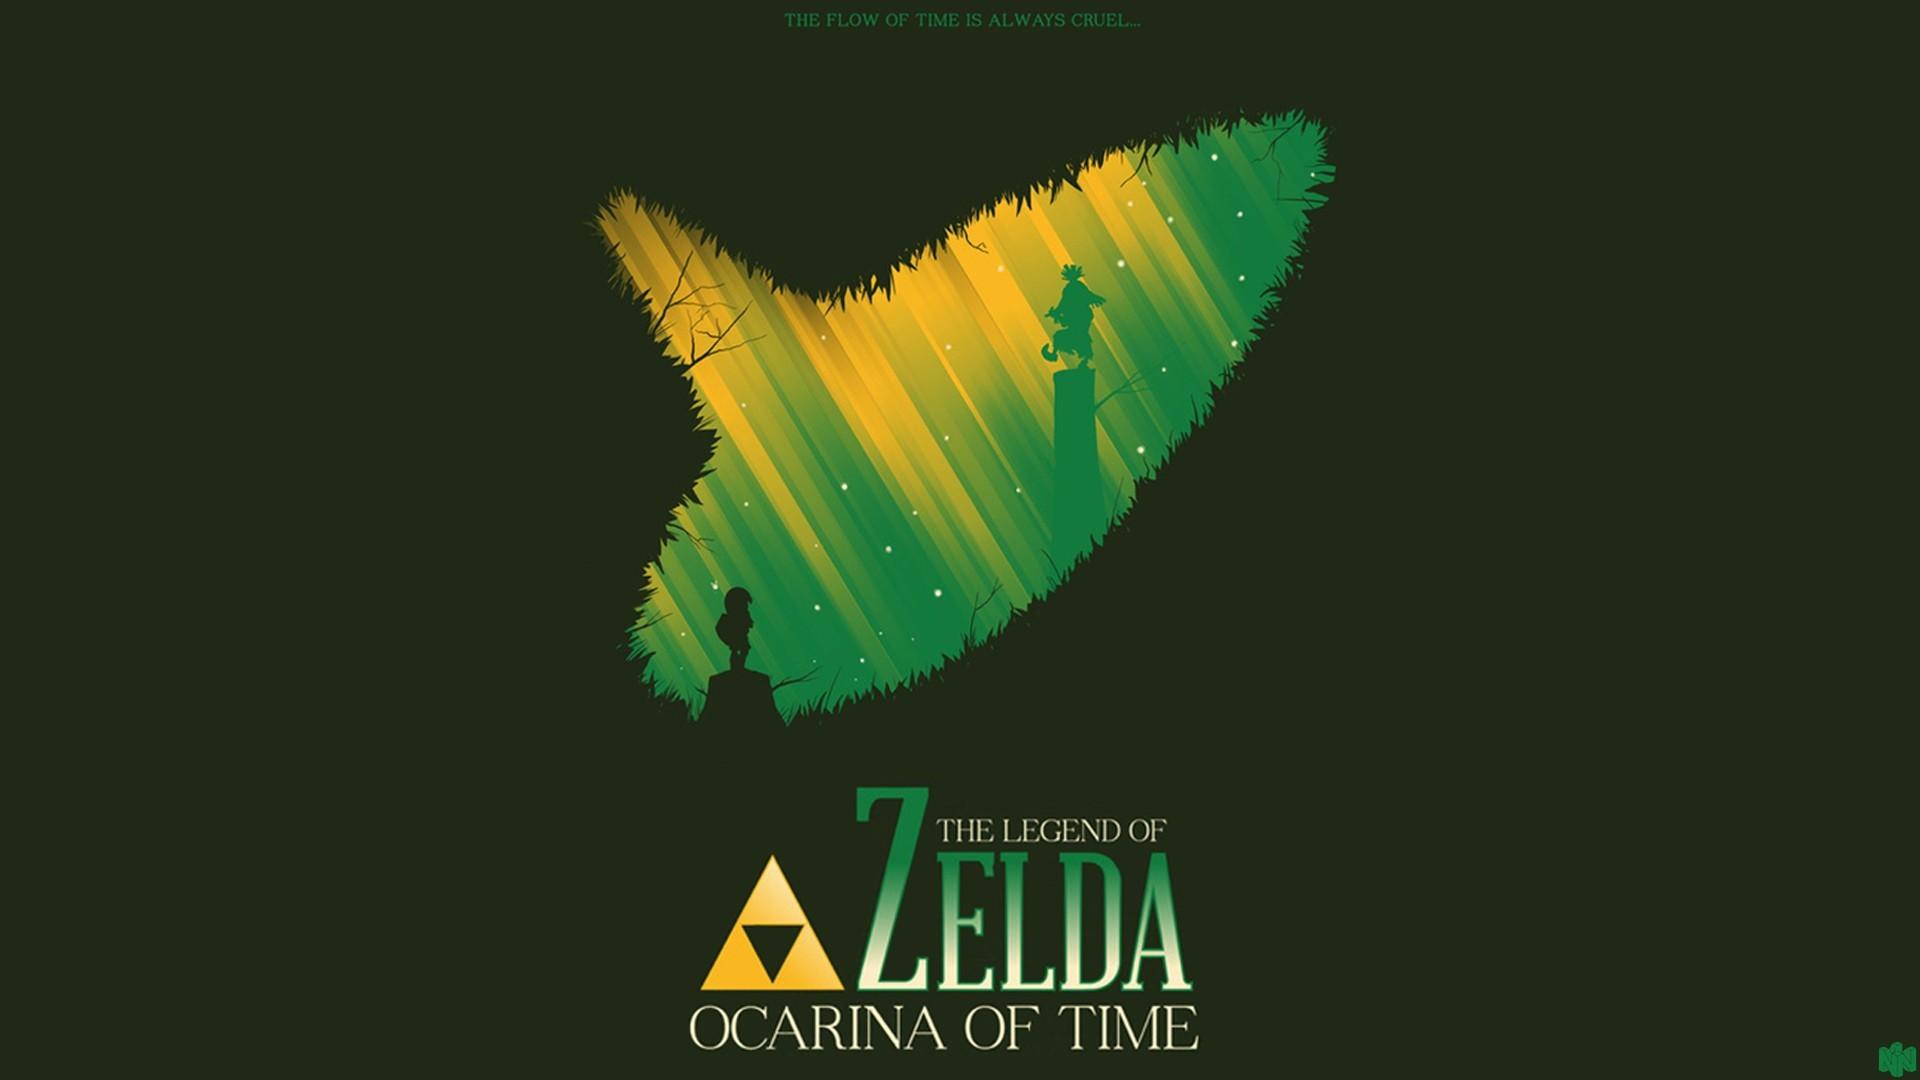 … Zelda Ganondorf triforce Hyrule The Legend of Zelda fan art Nintendo 64  The Legend of Zelda: Ocarina of Time green background Shigeru Miyamoto  wallpaper …